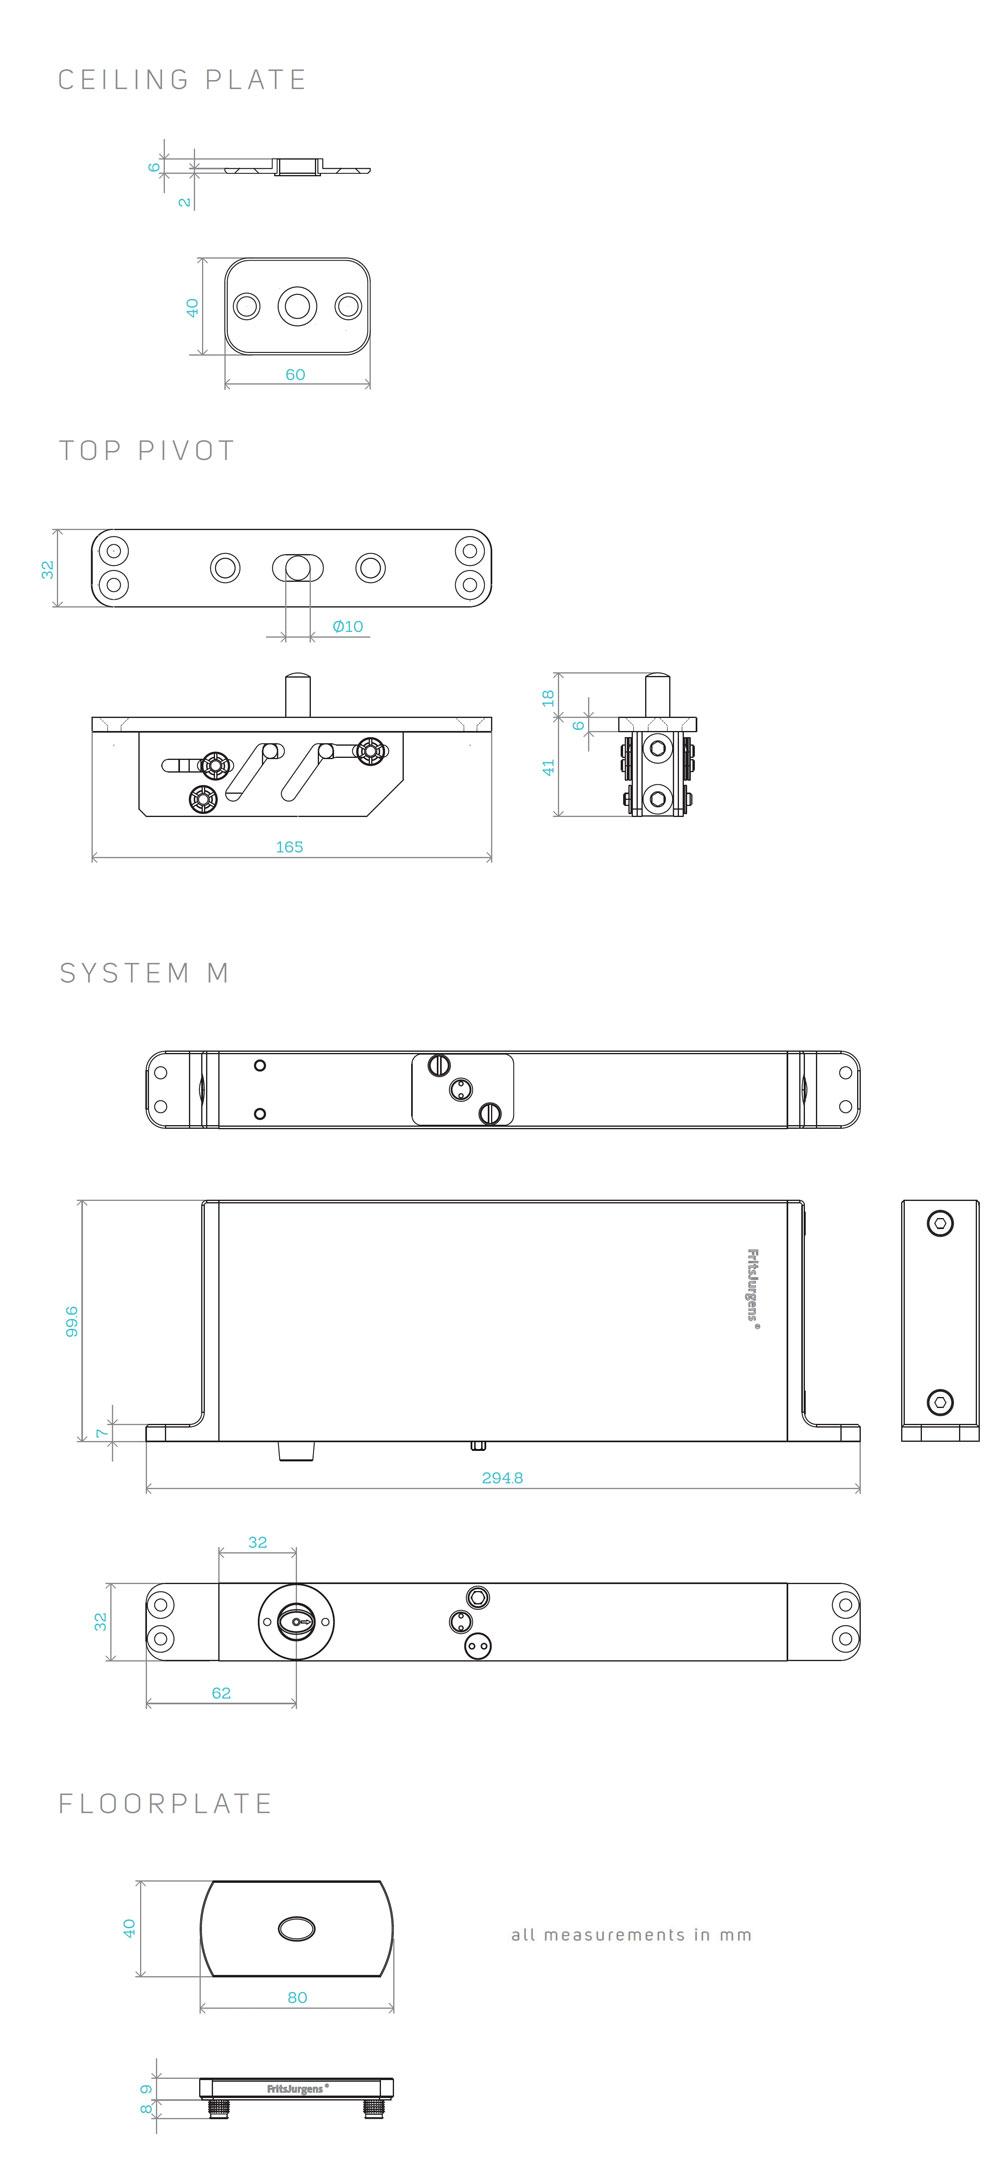 SystemMdrwgs3.jpg